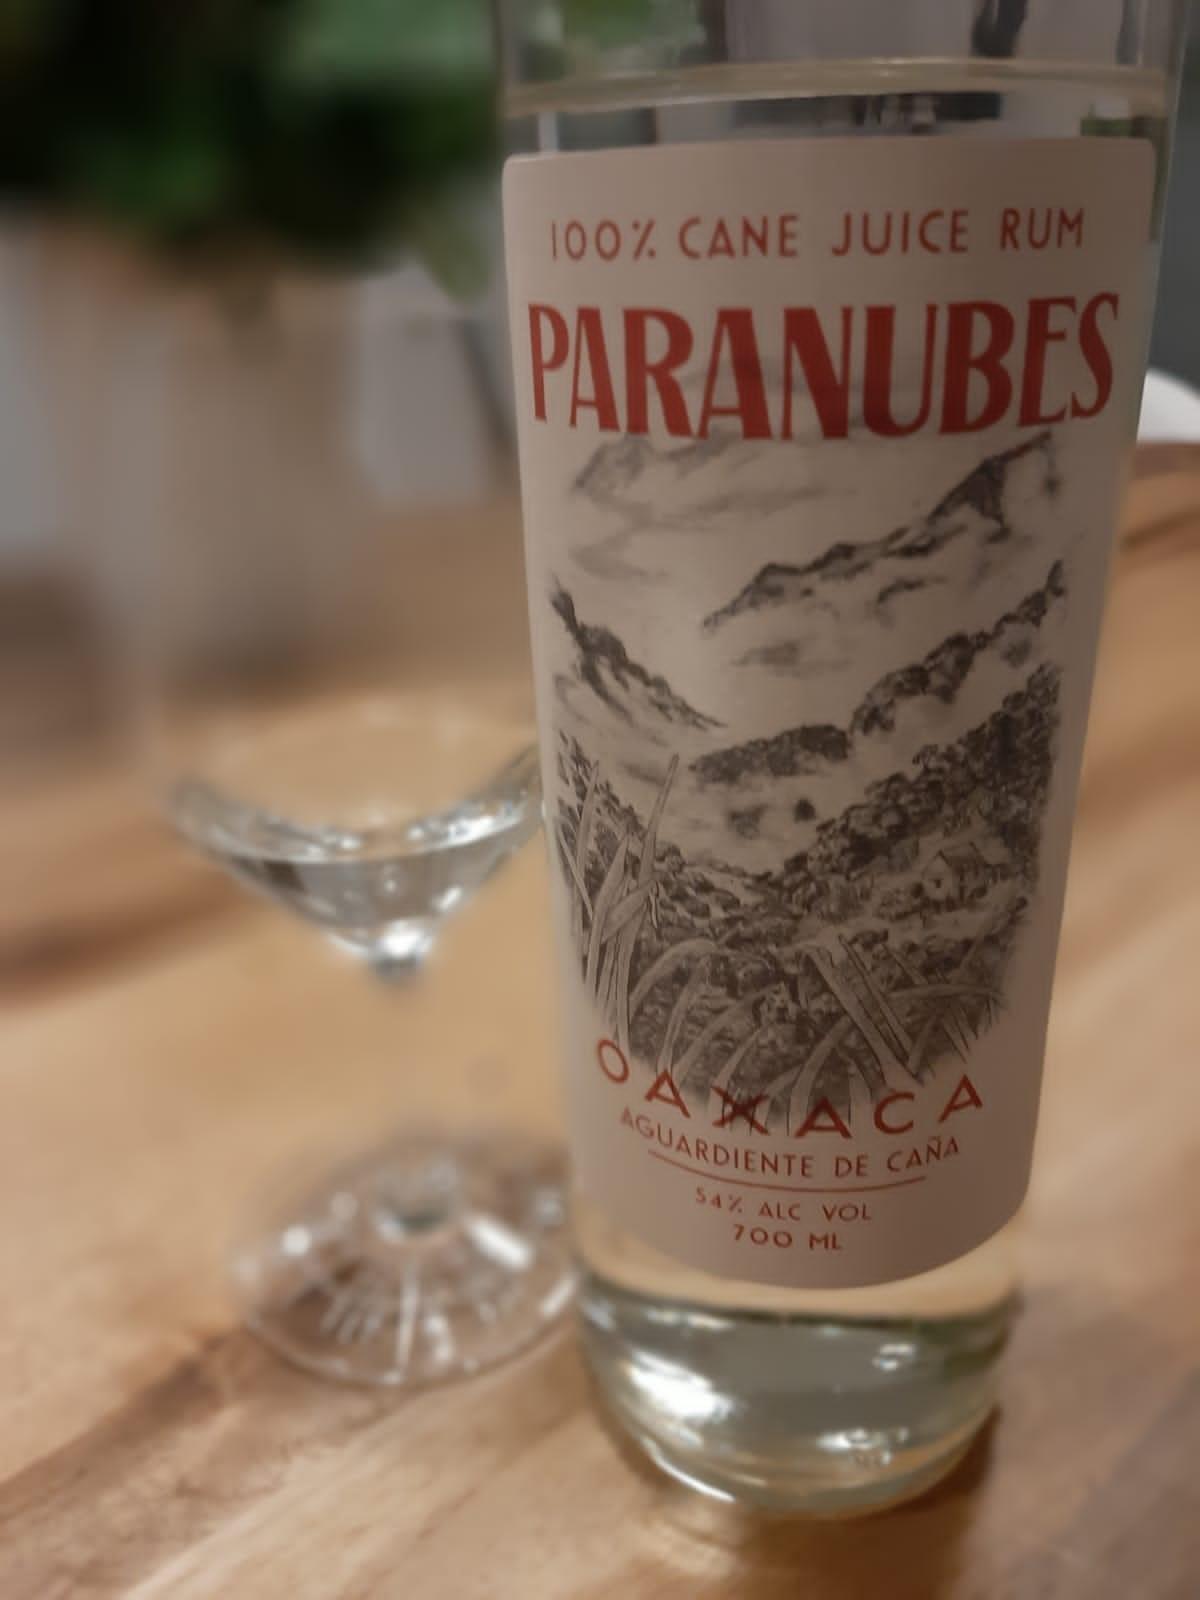 Paranubes Bottle